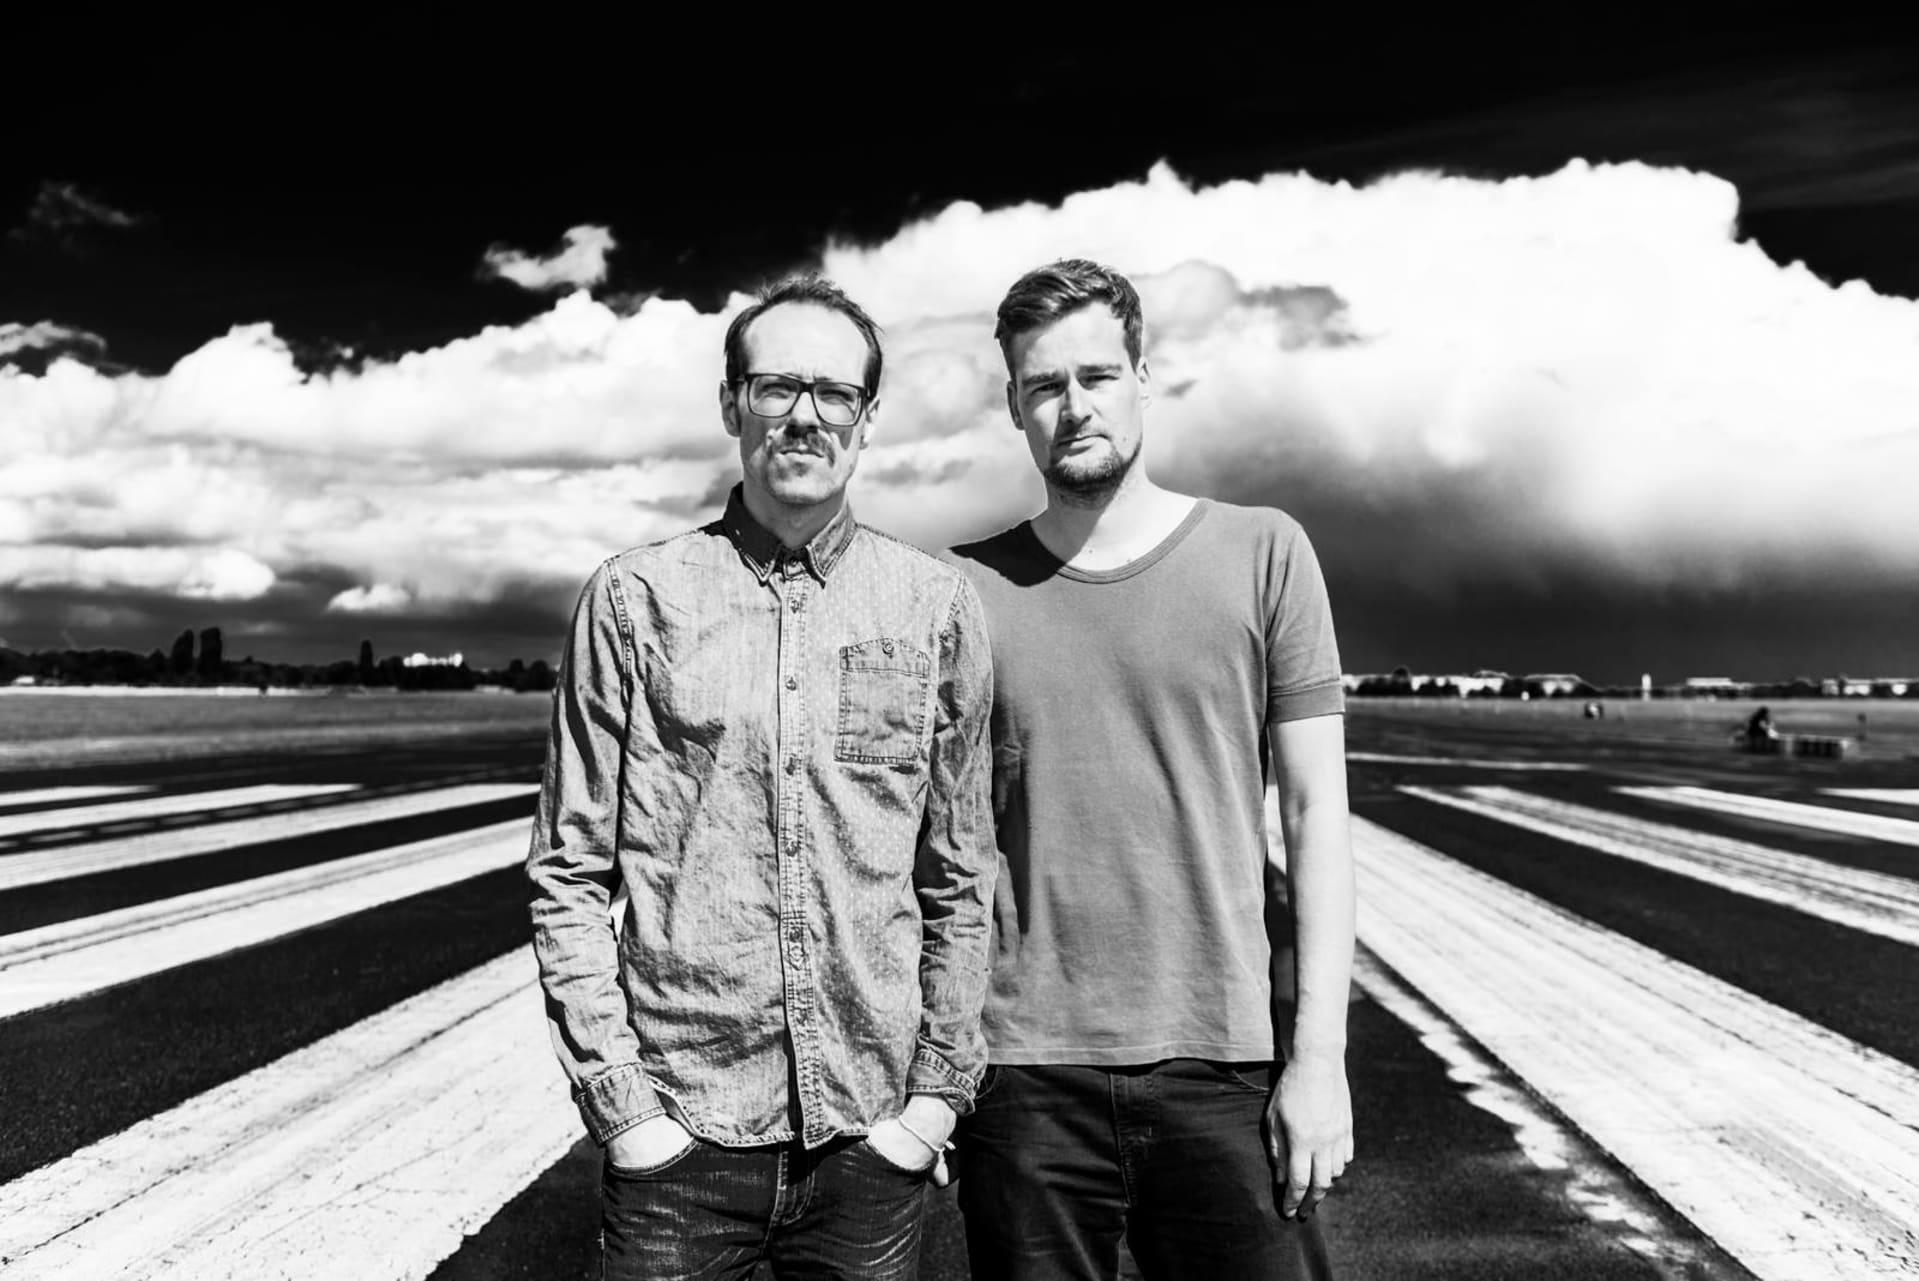 Interviu Kollektiv Turmstrasse: nemții al căror sound iese din stereotipul techno made in Germany